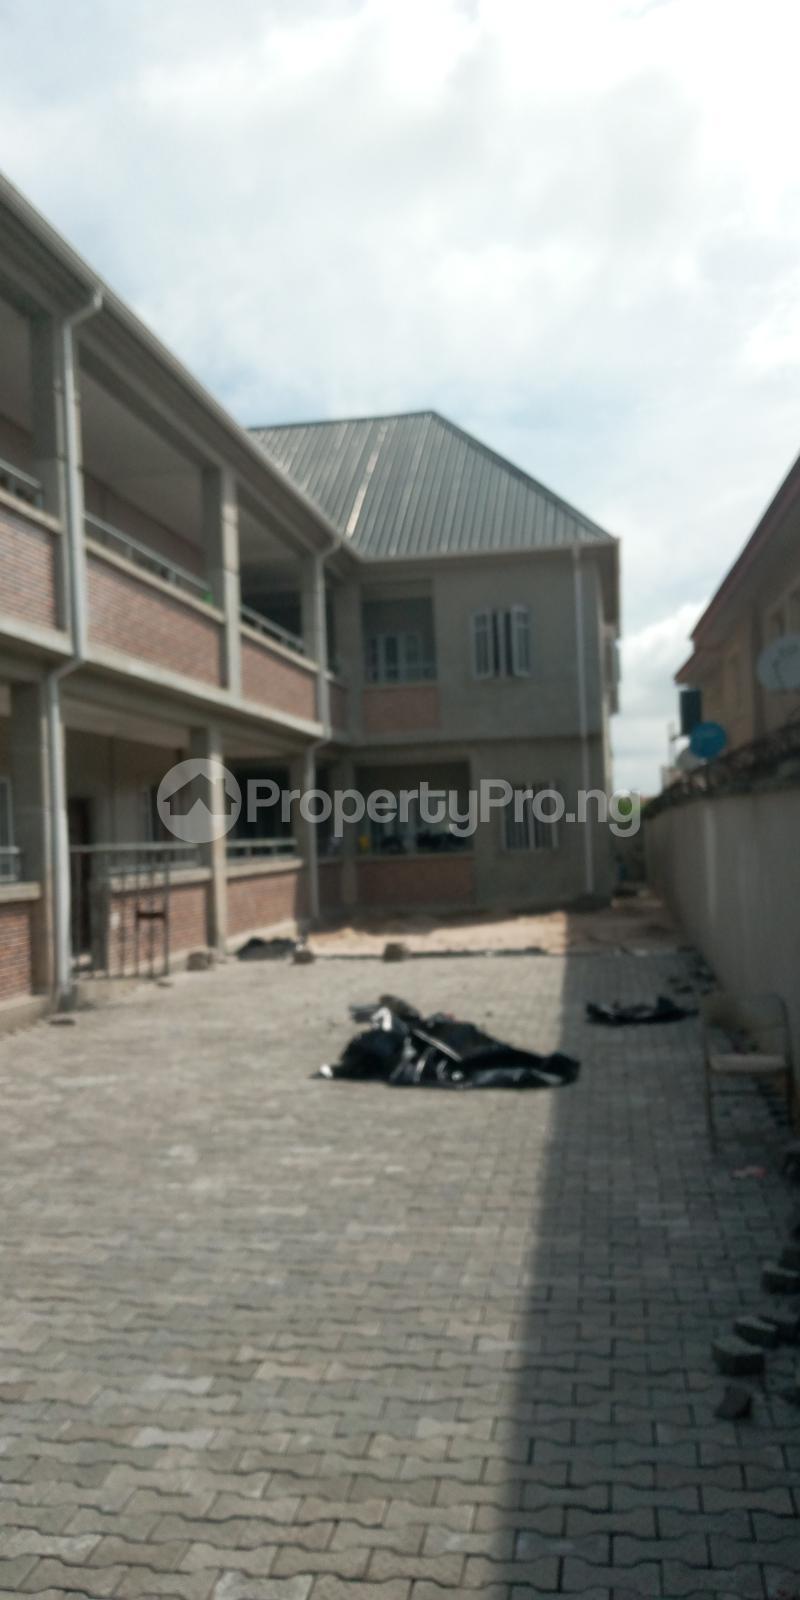 School Commercial Property for sale Eputu Ibeju-Lekki Lagos - 2